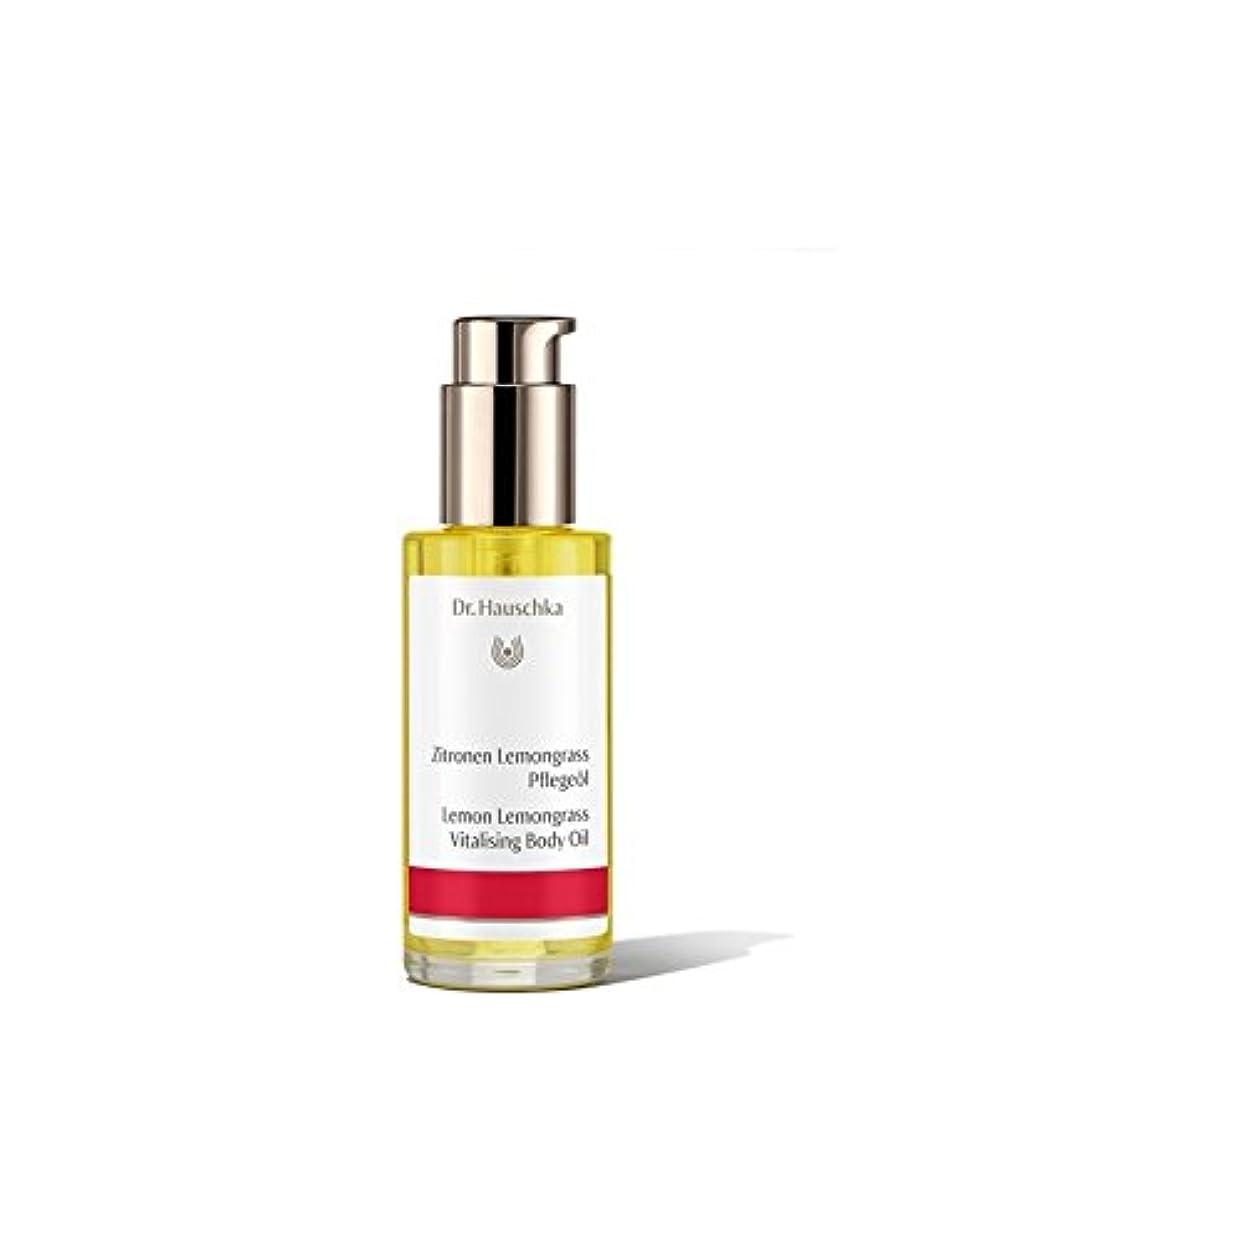 Dr. Hauschka Lemon Lemongrass Vitalising Body Oil (75ml) - ハウシュカレモンレモングラスボディオイル(75ミリリットル) [並行輸入品]